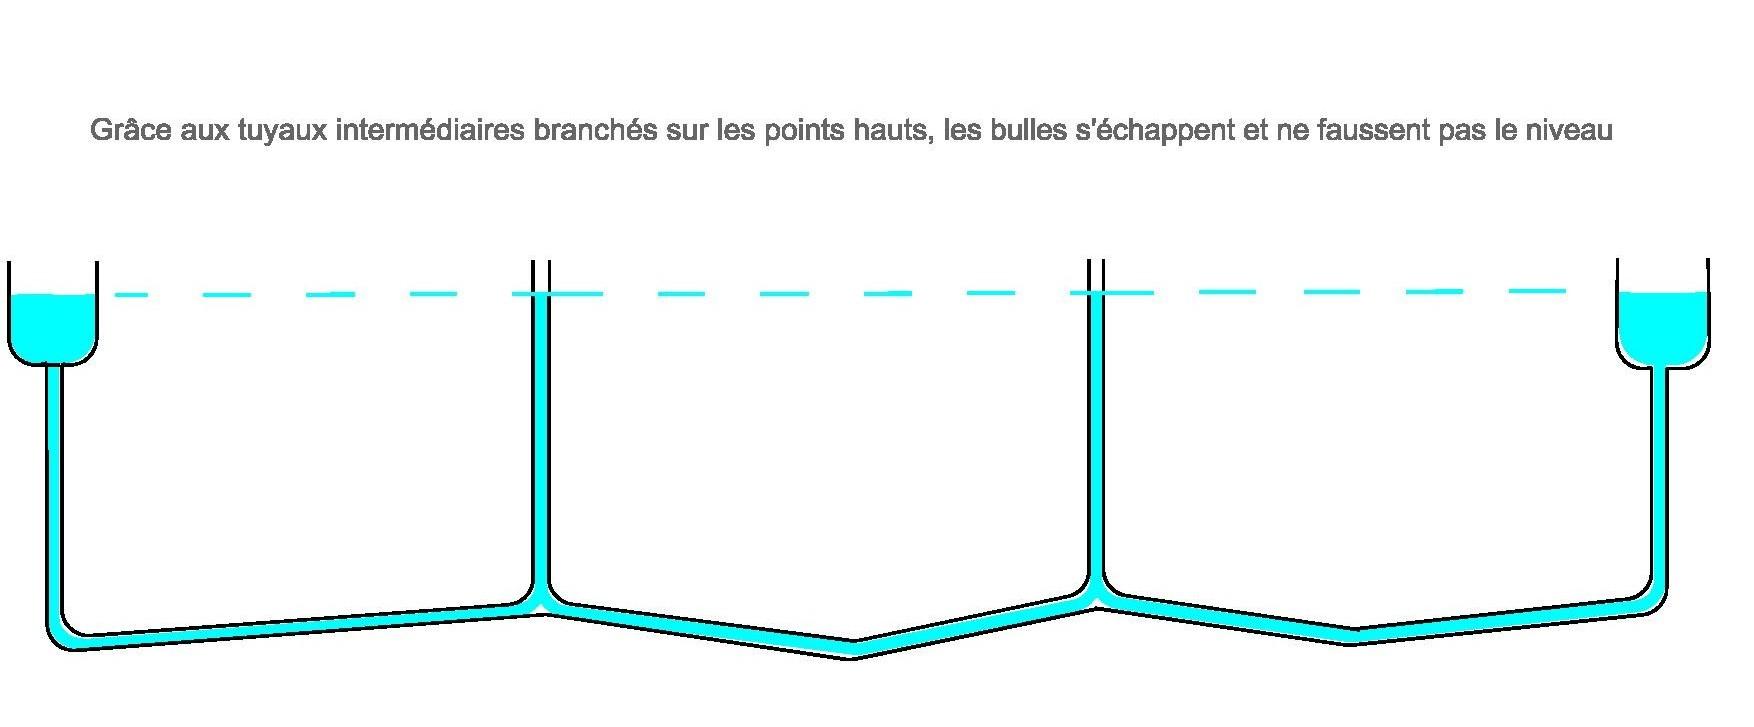 https://www.academie-pontdugard.com/wp-content/uploads/2013/11/niveau-%C3%A0eau-longue-port%C3%A9e-Model-_1_-e1385029187209.jpg